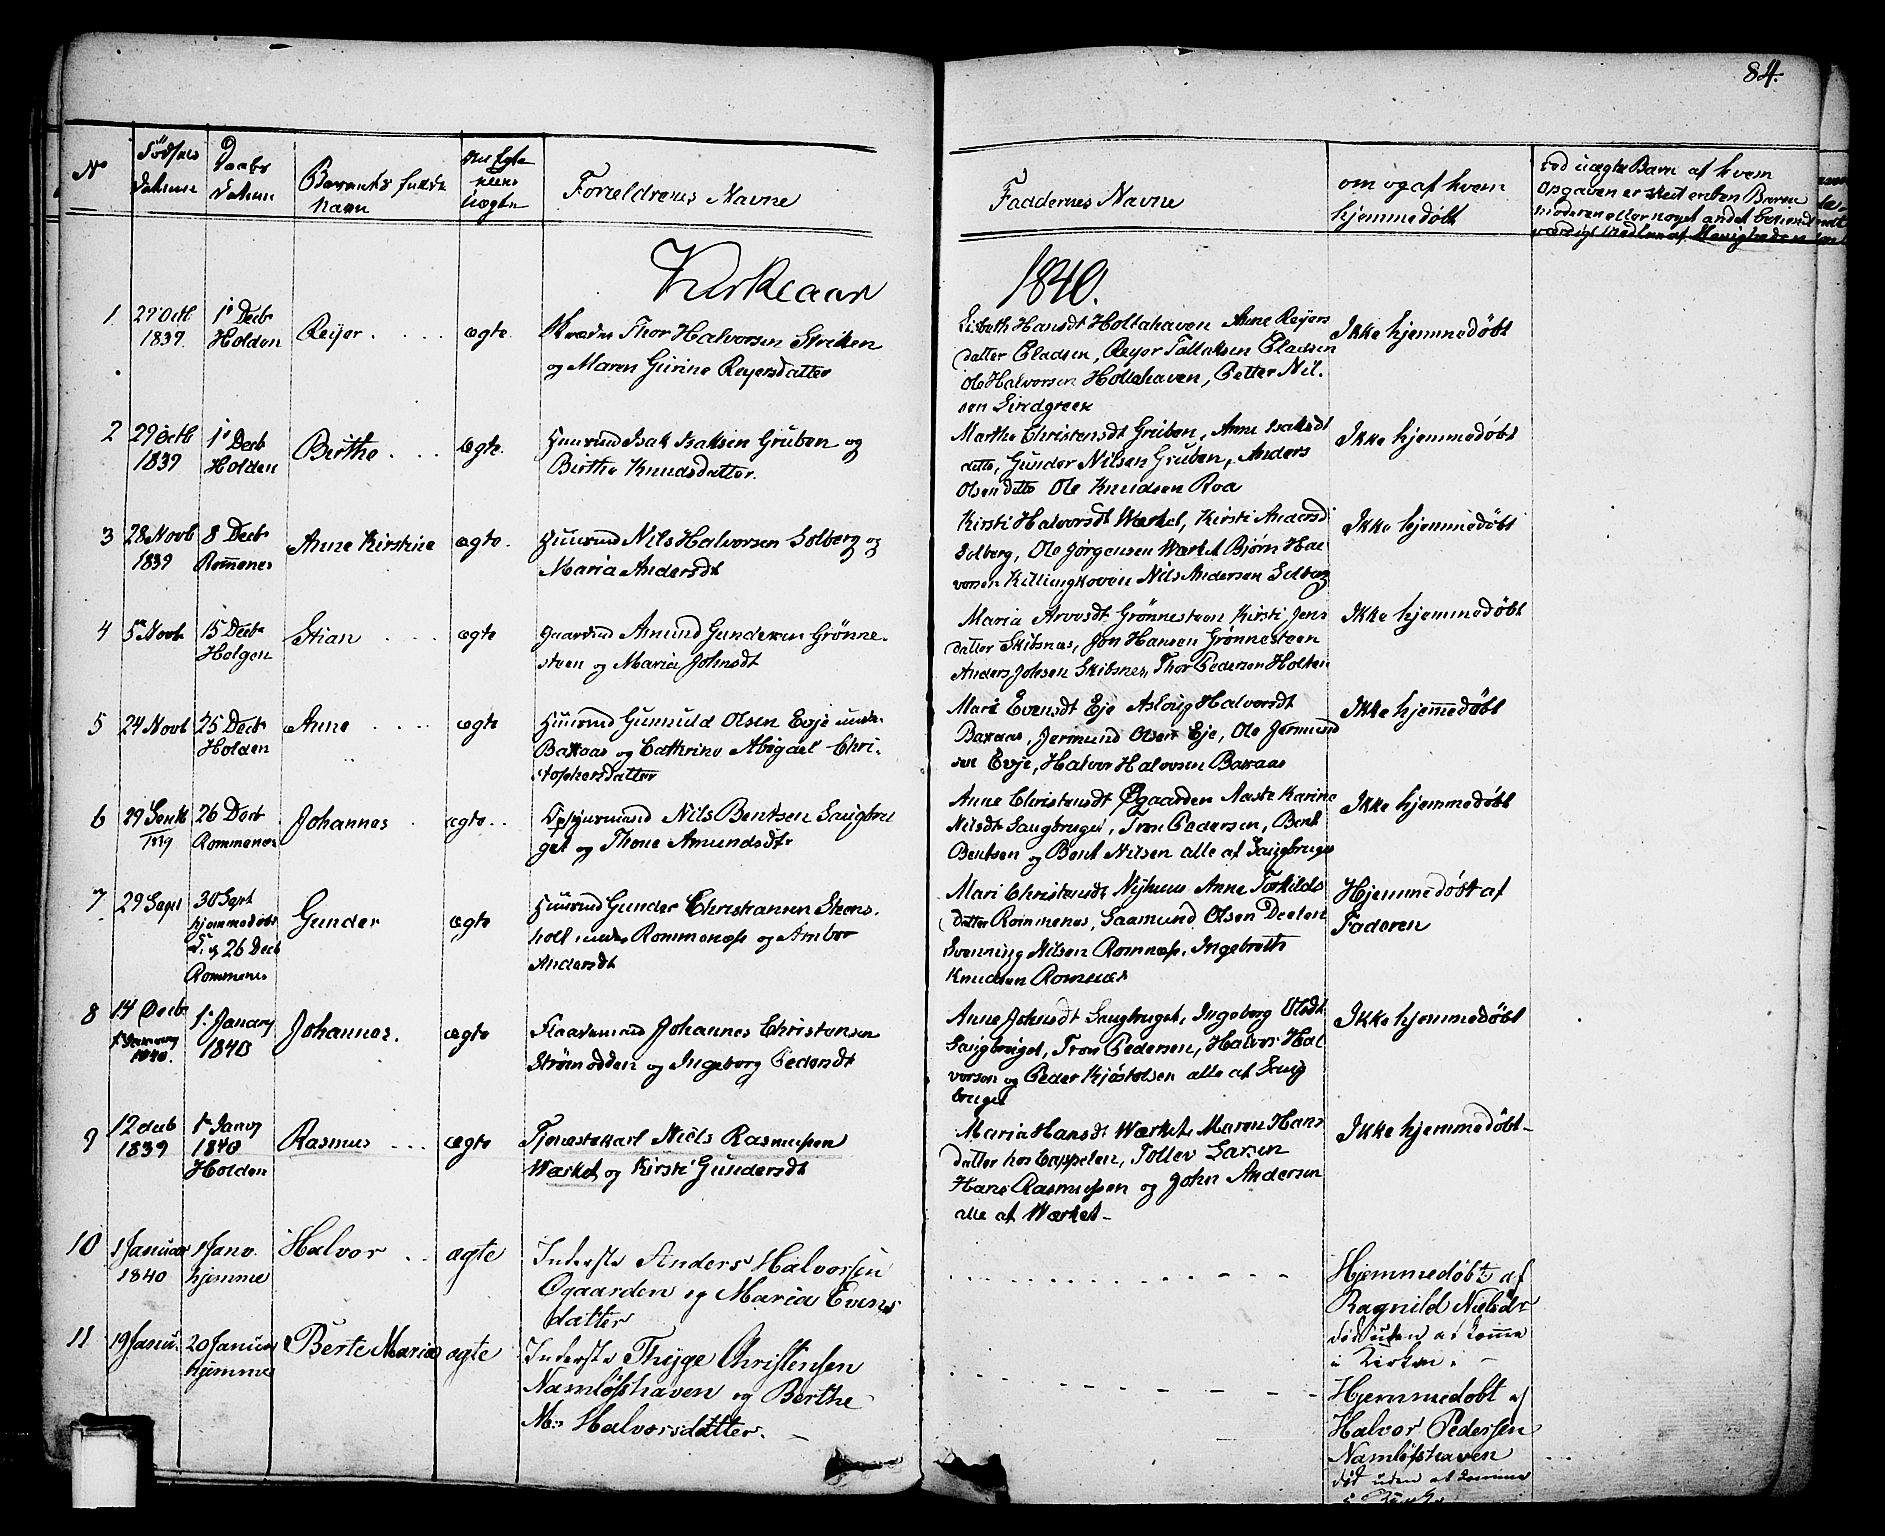 SAKO, Holla kirkebøker, F/Fa/L0004: Ministerialbok nr. 4, 1830-1848, s. 84